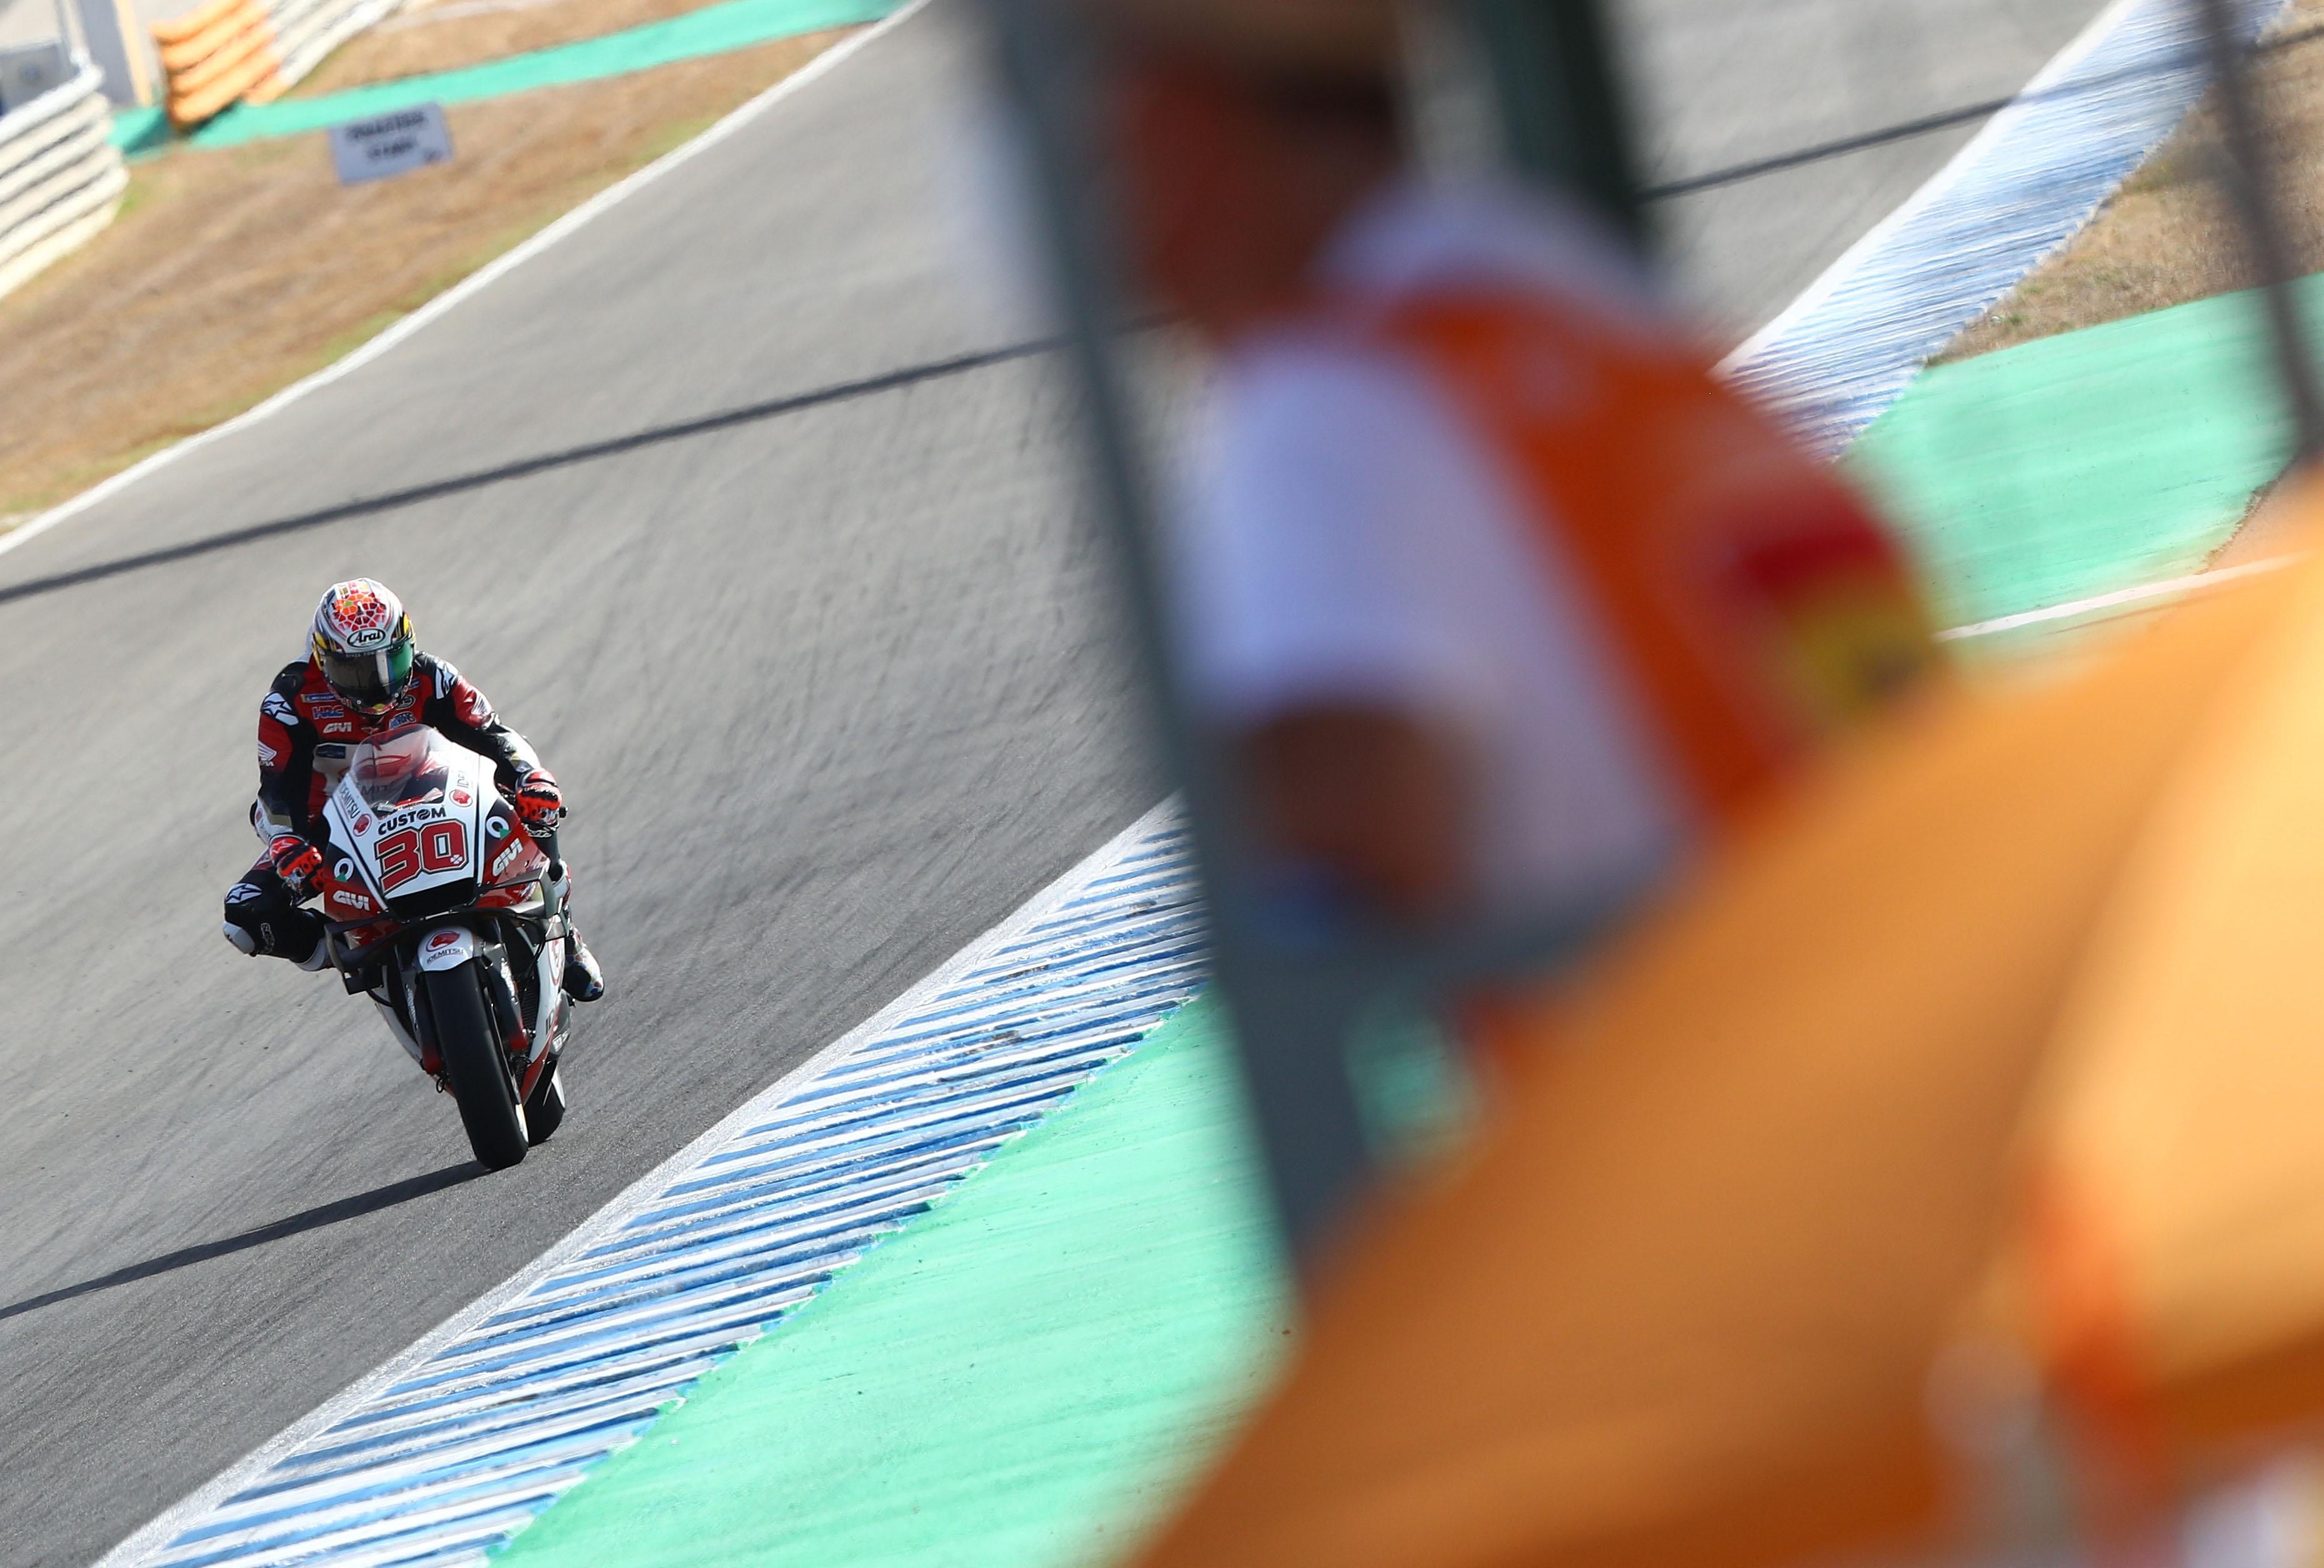 Takaaki Nakagami LCR Honda Jerez MotoGP 2020